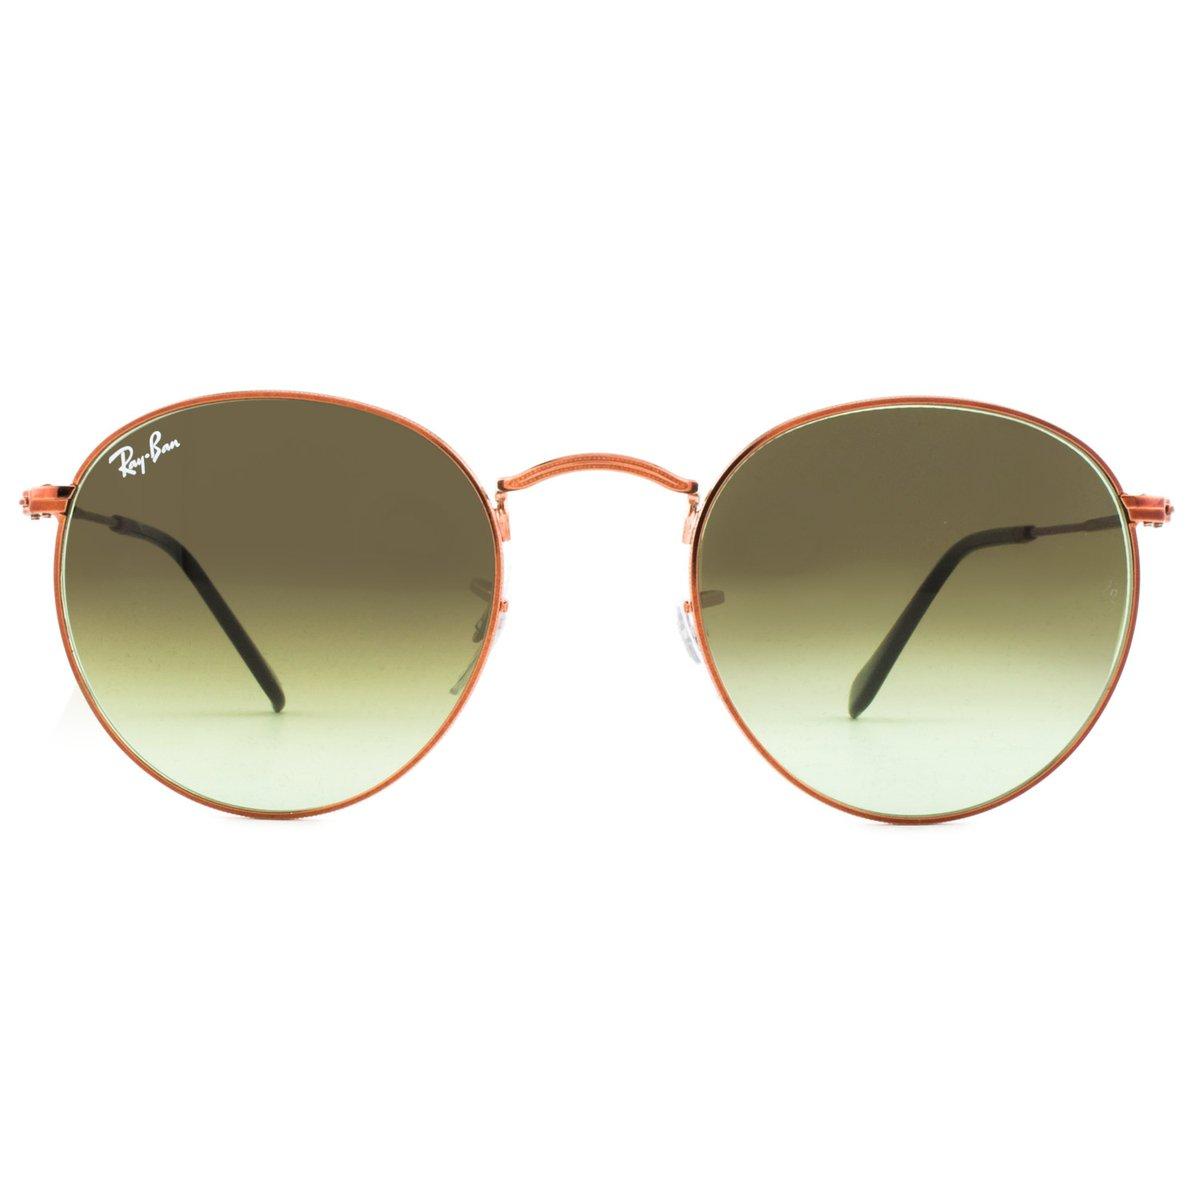 Óculos de Sol Ray Ban Round Metal RB3447 9002A6-50 Feminino - Compre Agora    Netshoes 1e3b1134d5